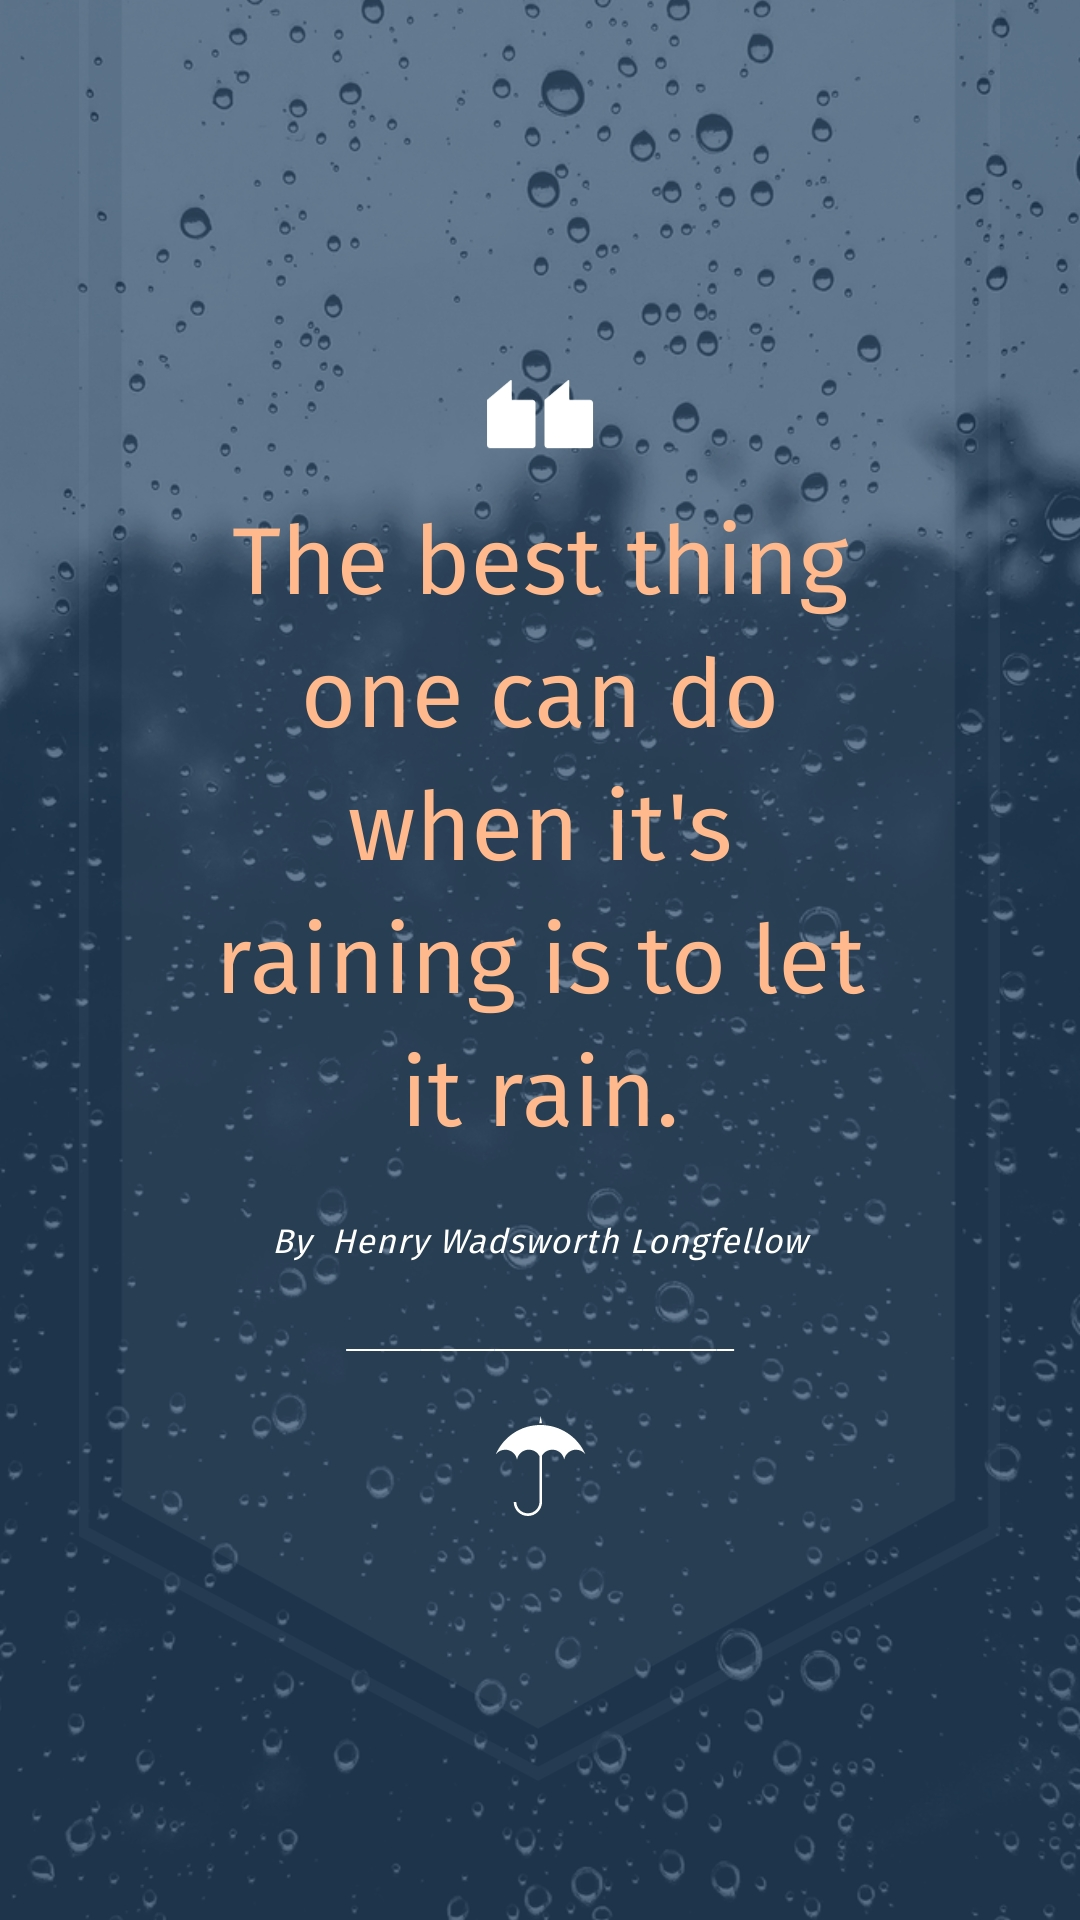 Rain Quote Phone Wallpaper Template